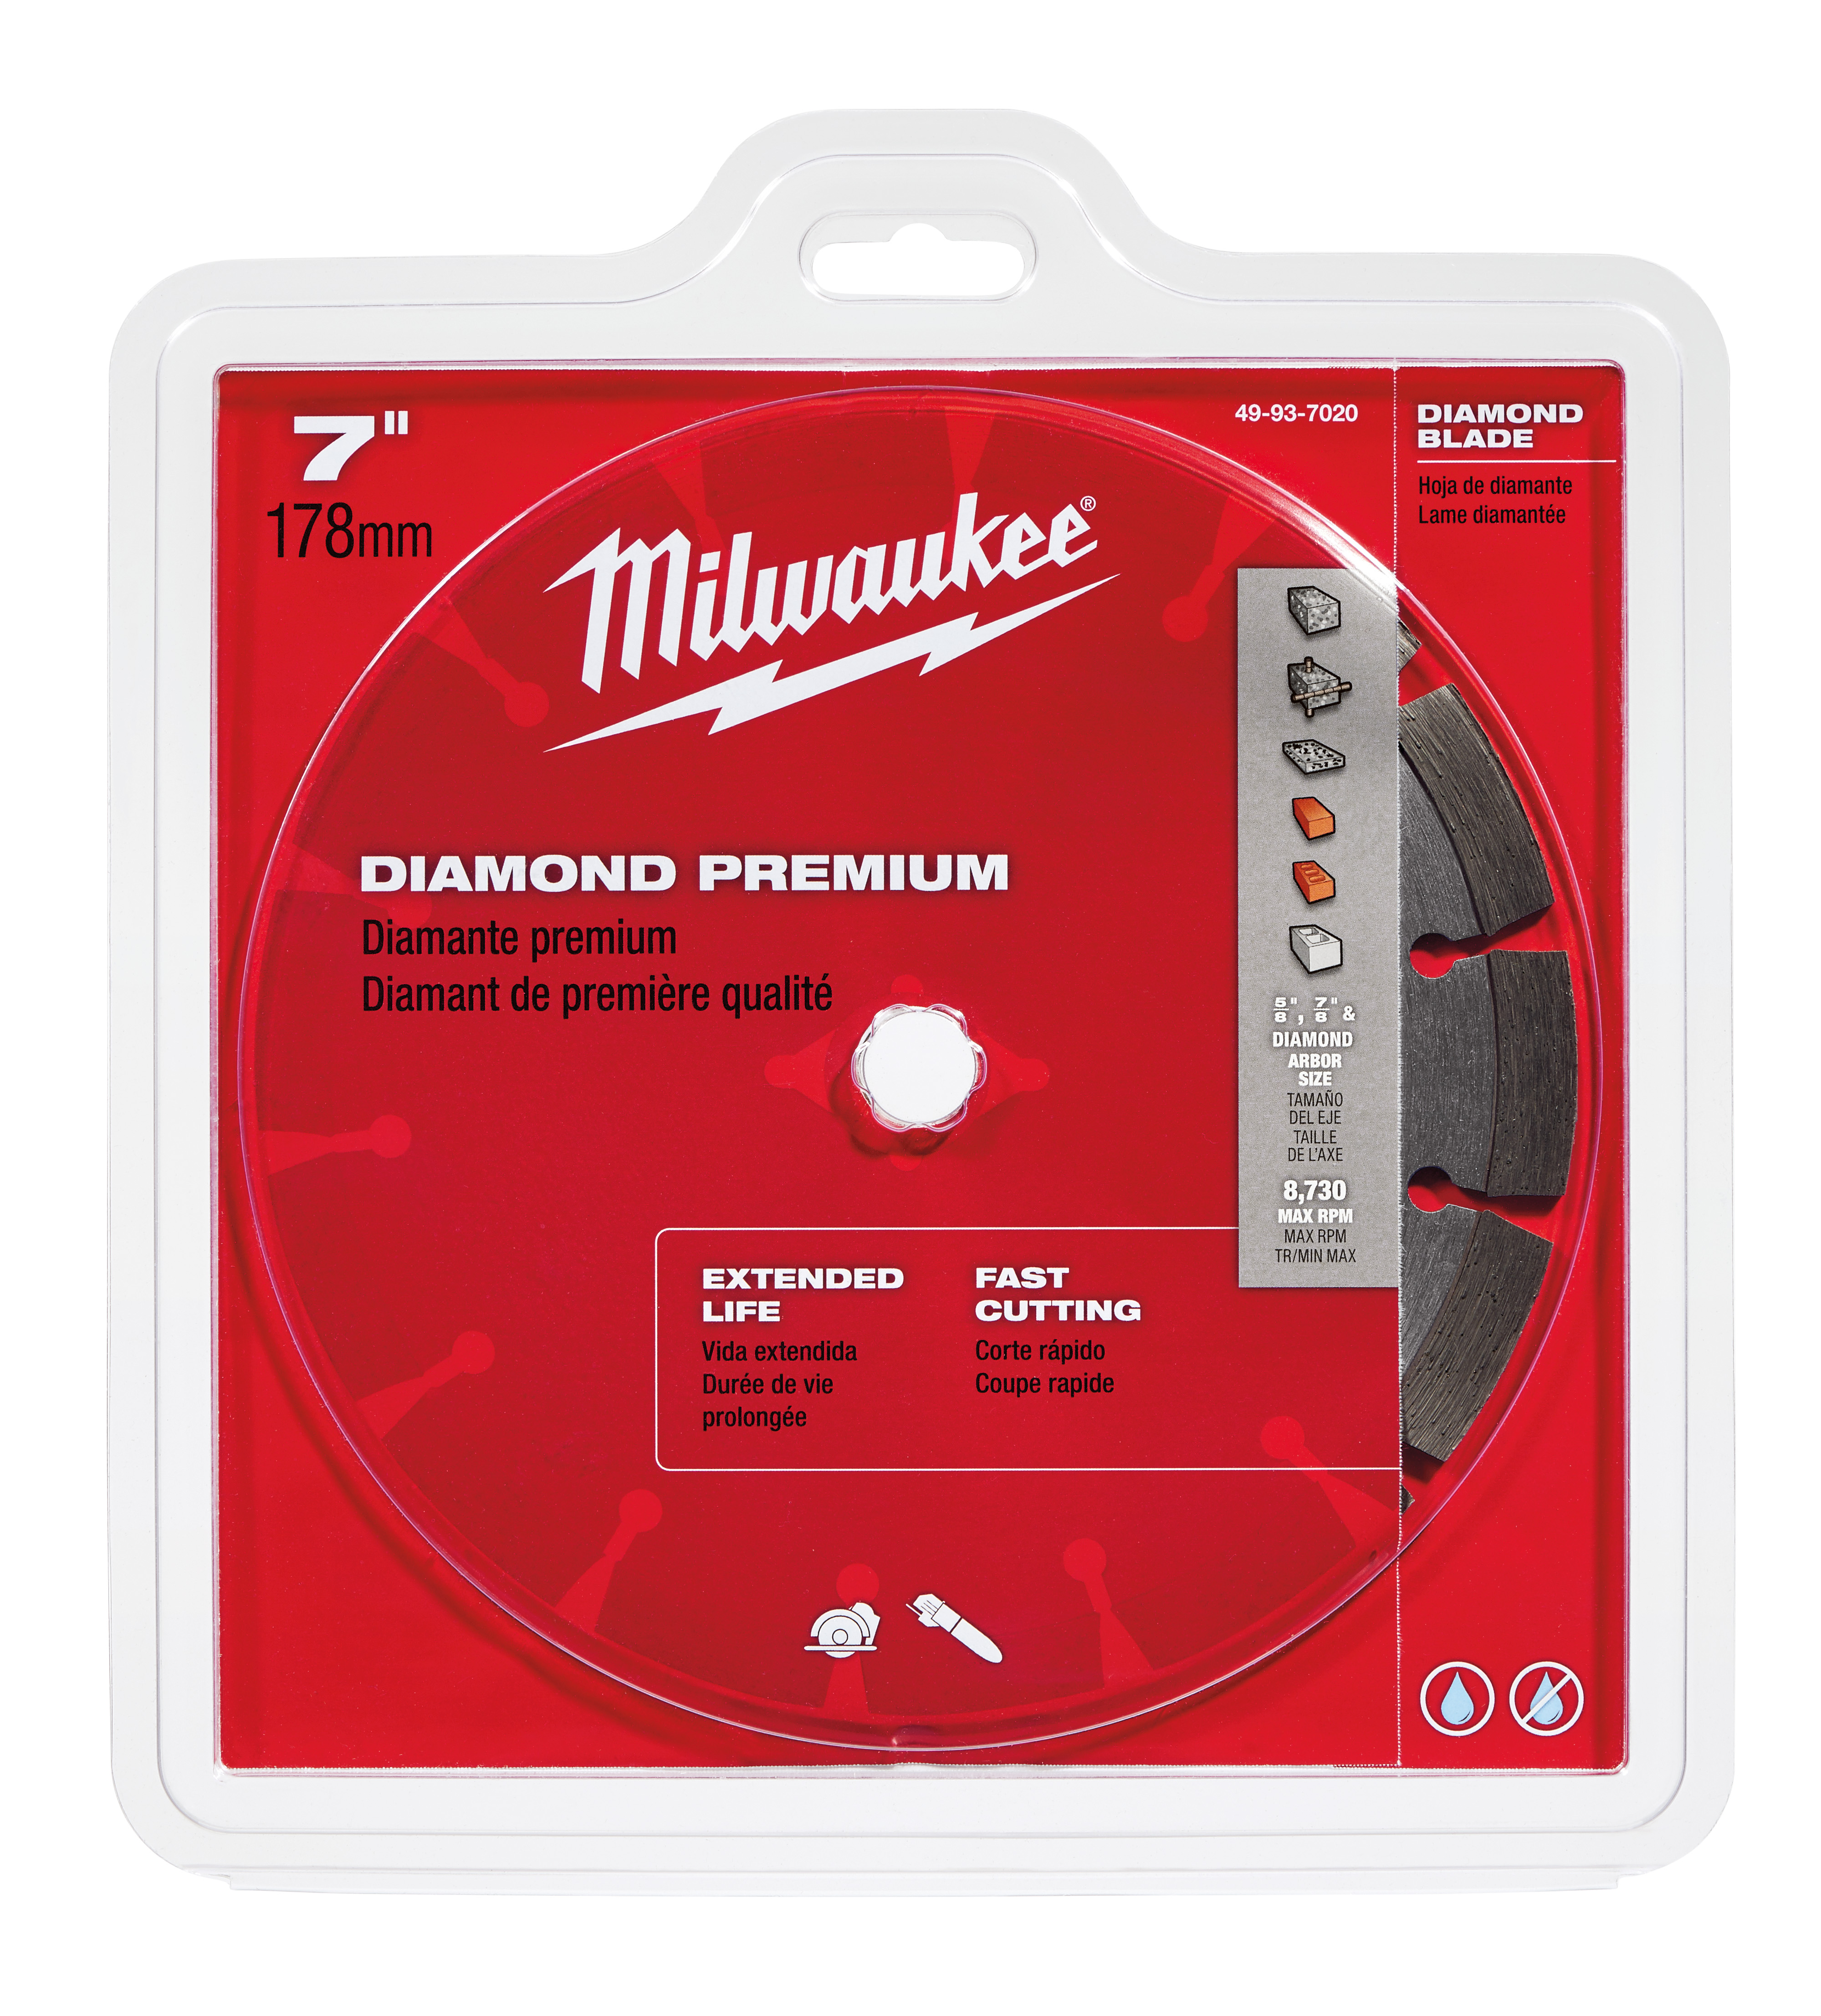 Milwaukee® 49-93-7020 Premium Segmented Circular Diamond Saw Blade, 7 in Dia Blade, 5/8 in, 7/8 in Arbor/Shank, Dry/Wet Cutting